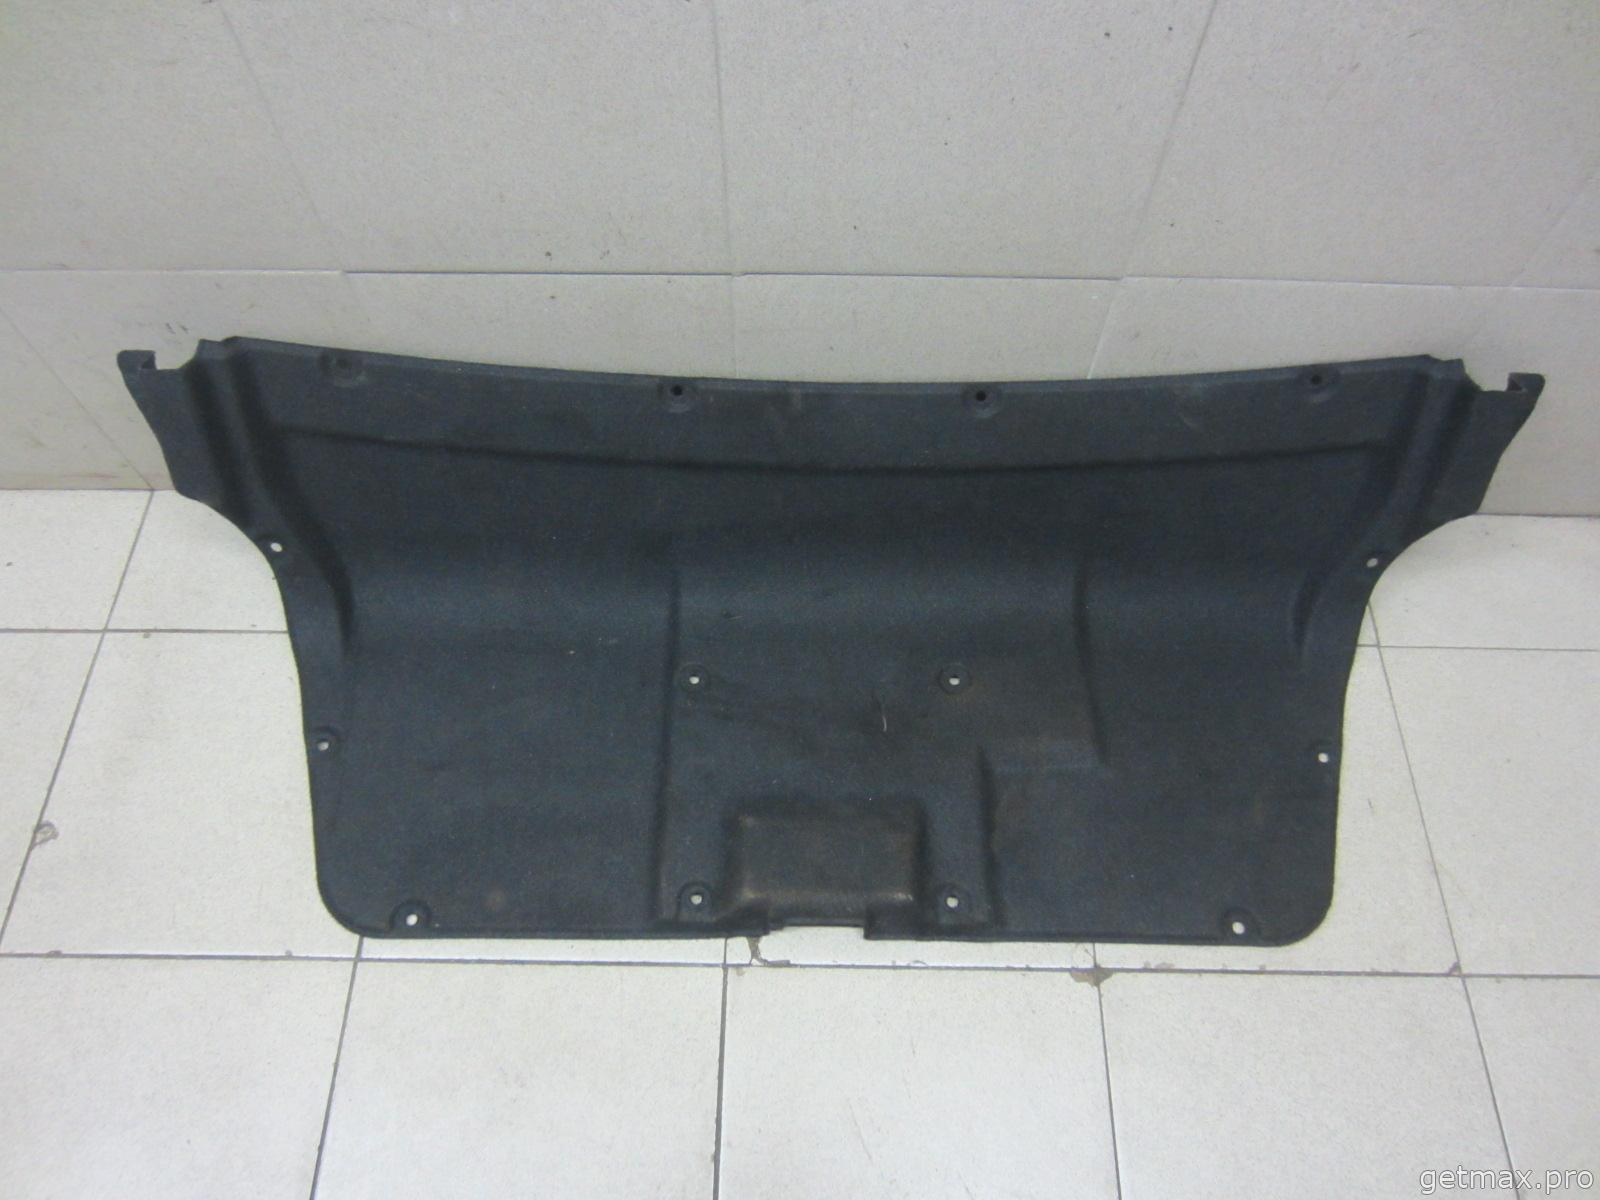 Обшивка крышки багажника (бу) Chevrolet Lacetti 2003-2013 купить